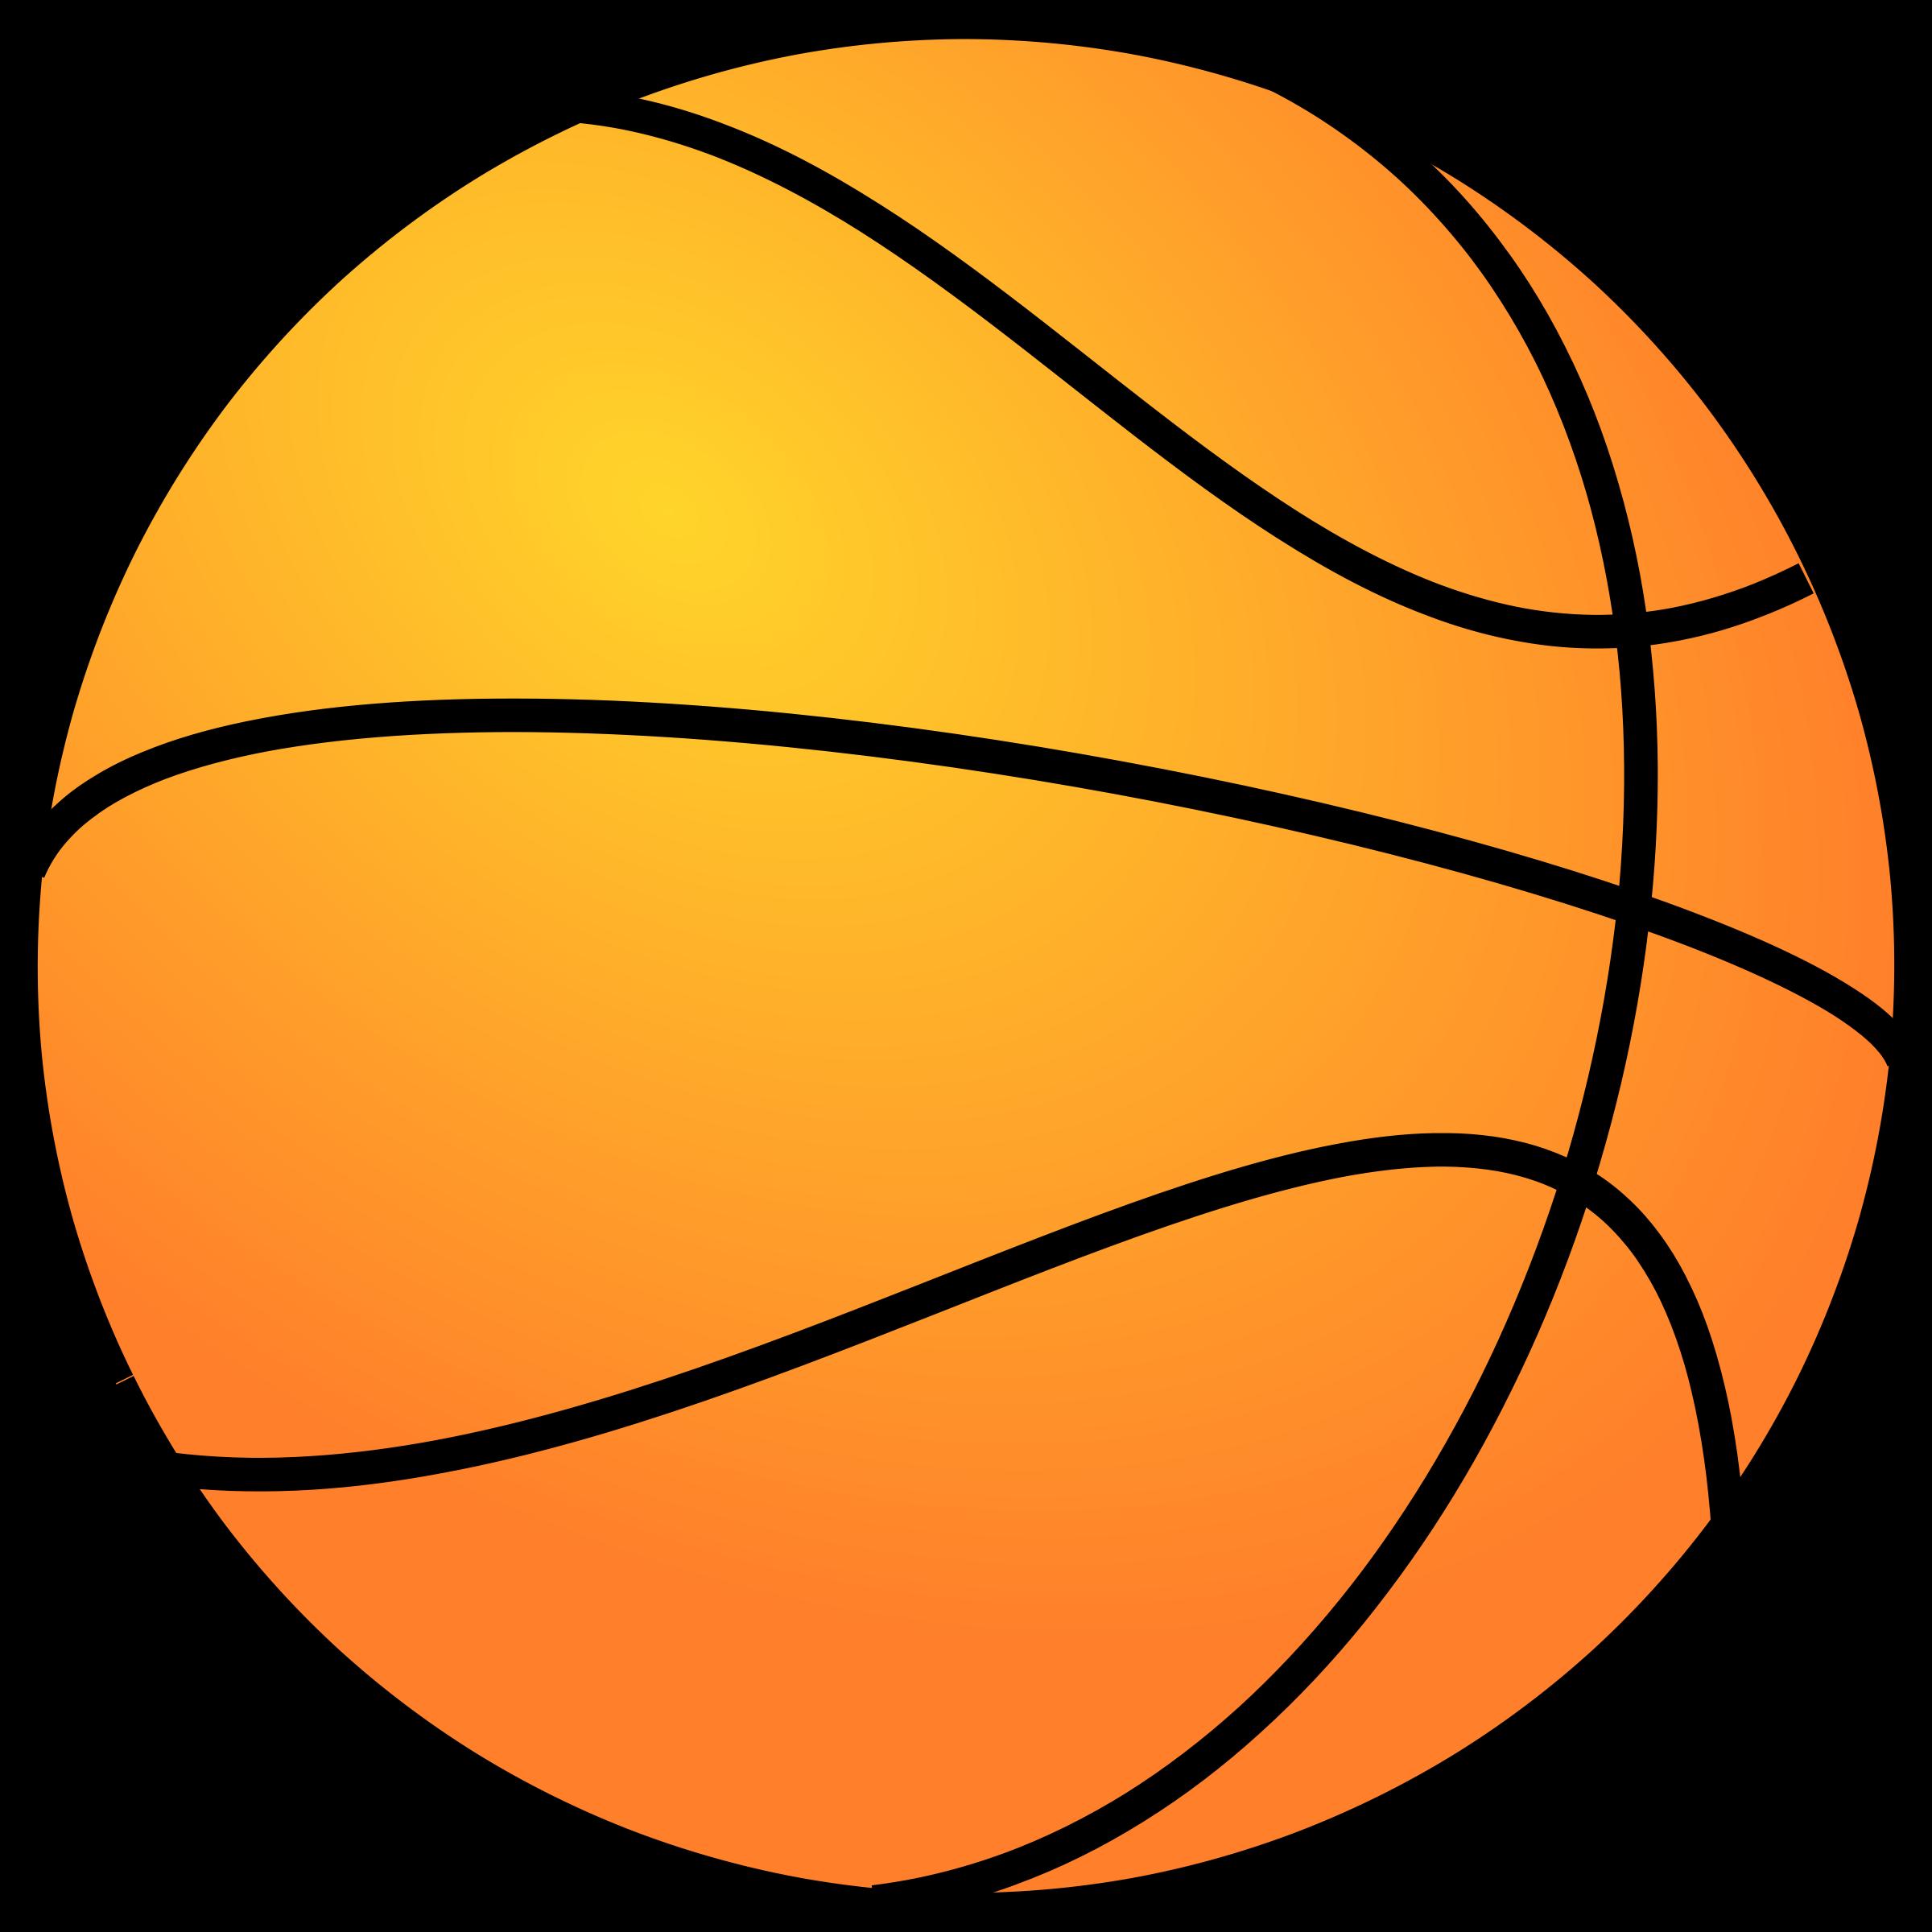 Basketball Clipart-Clipartlook.com-2400